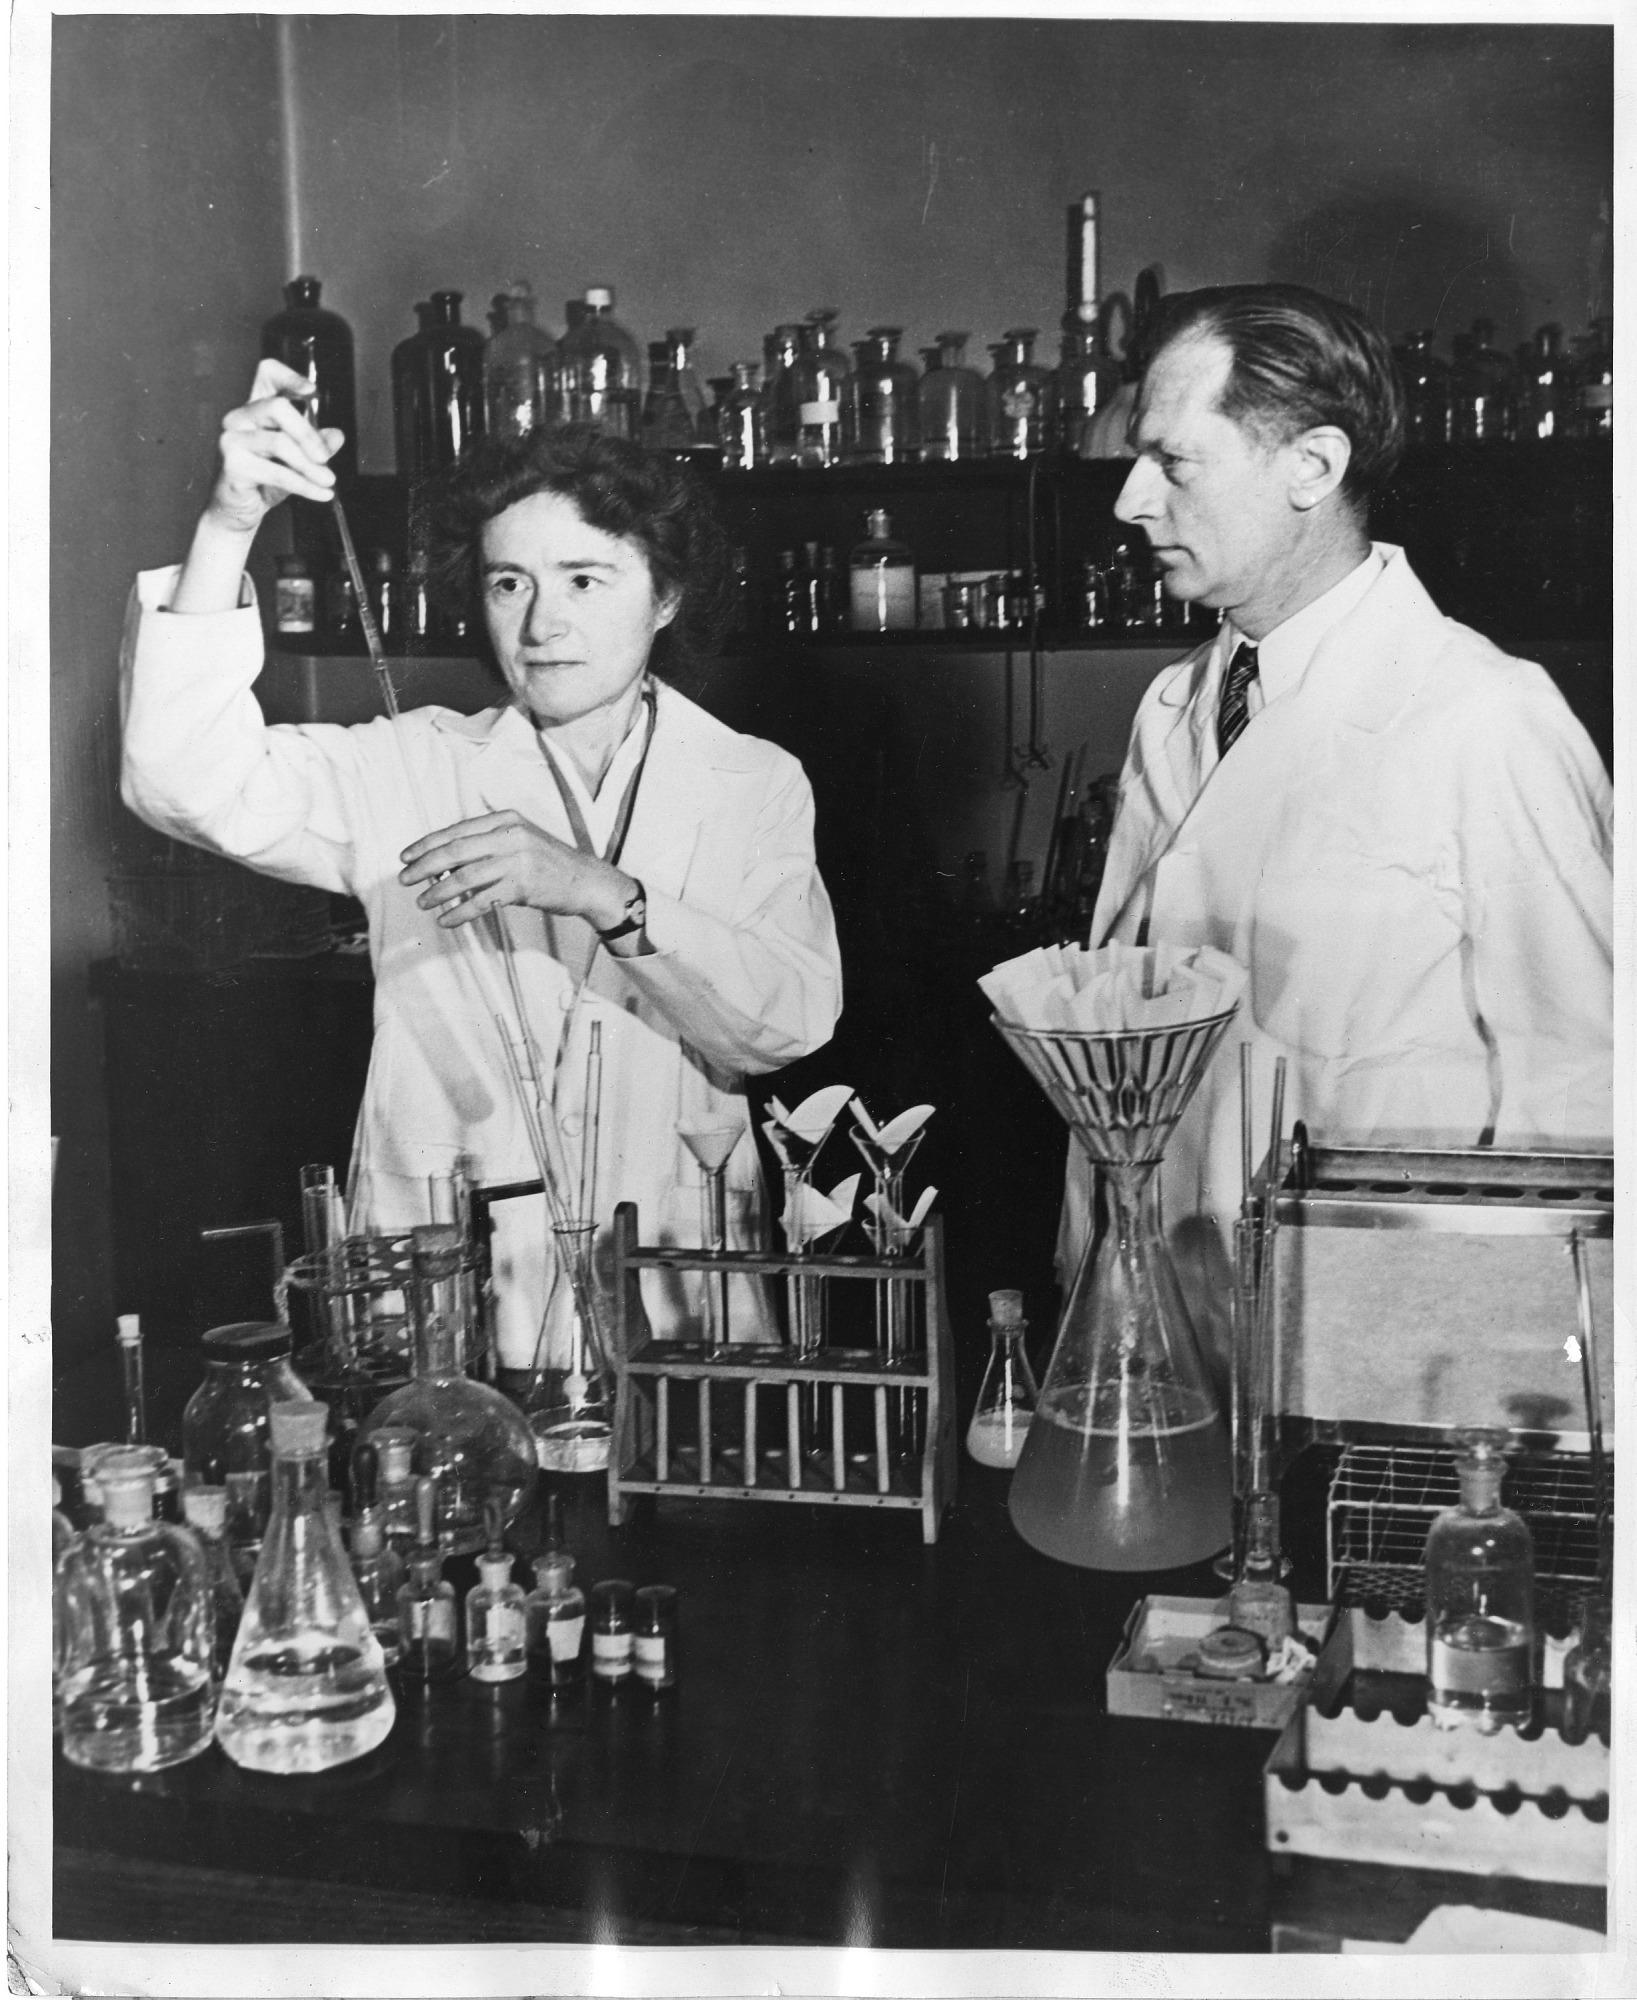 Gerty Theresa Radnitz Cori (1896-1957) and Carl Ferdinand Cori (1896-1984) 1947